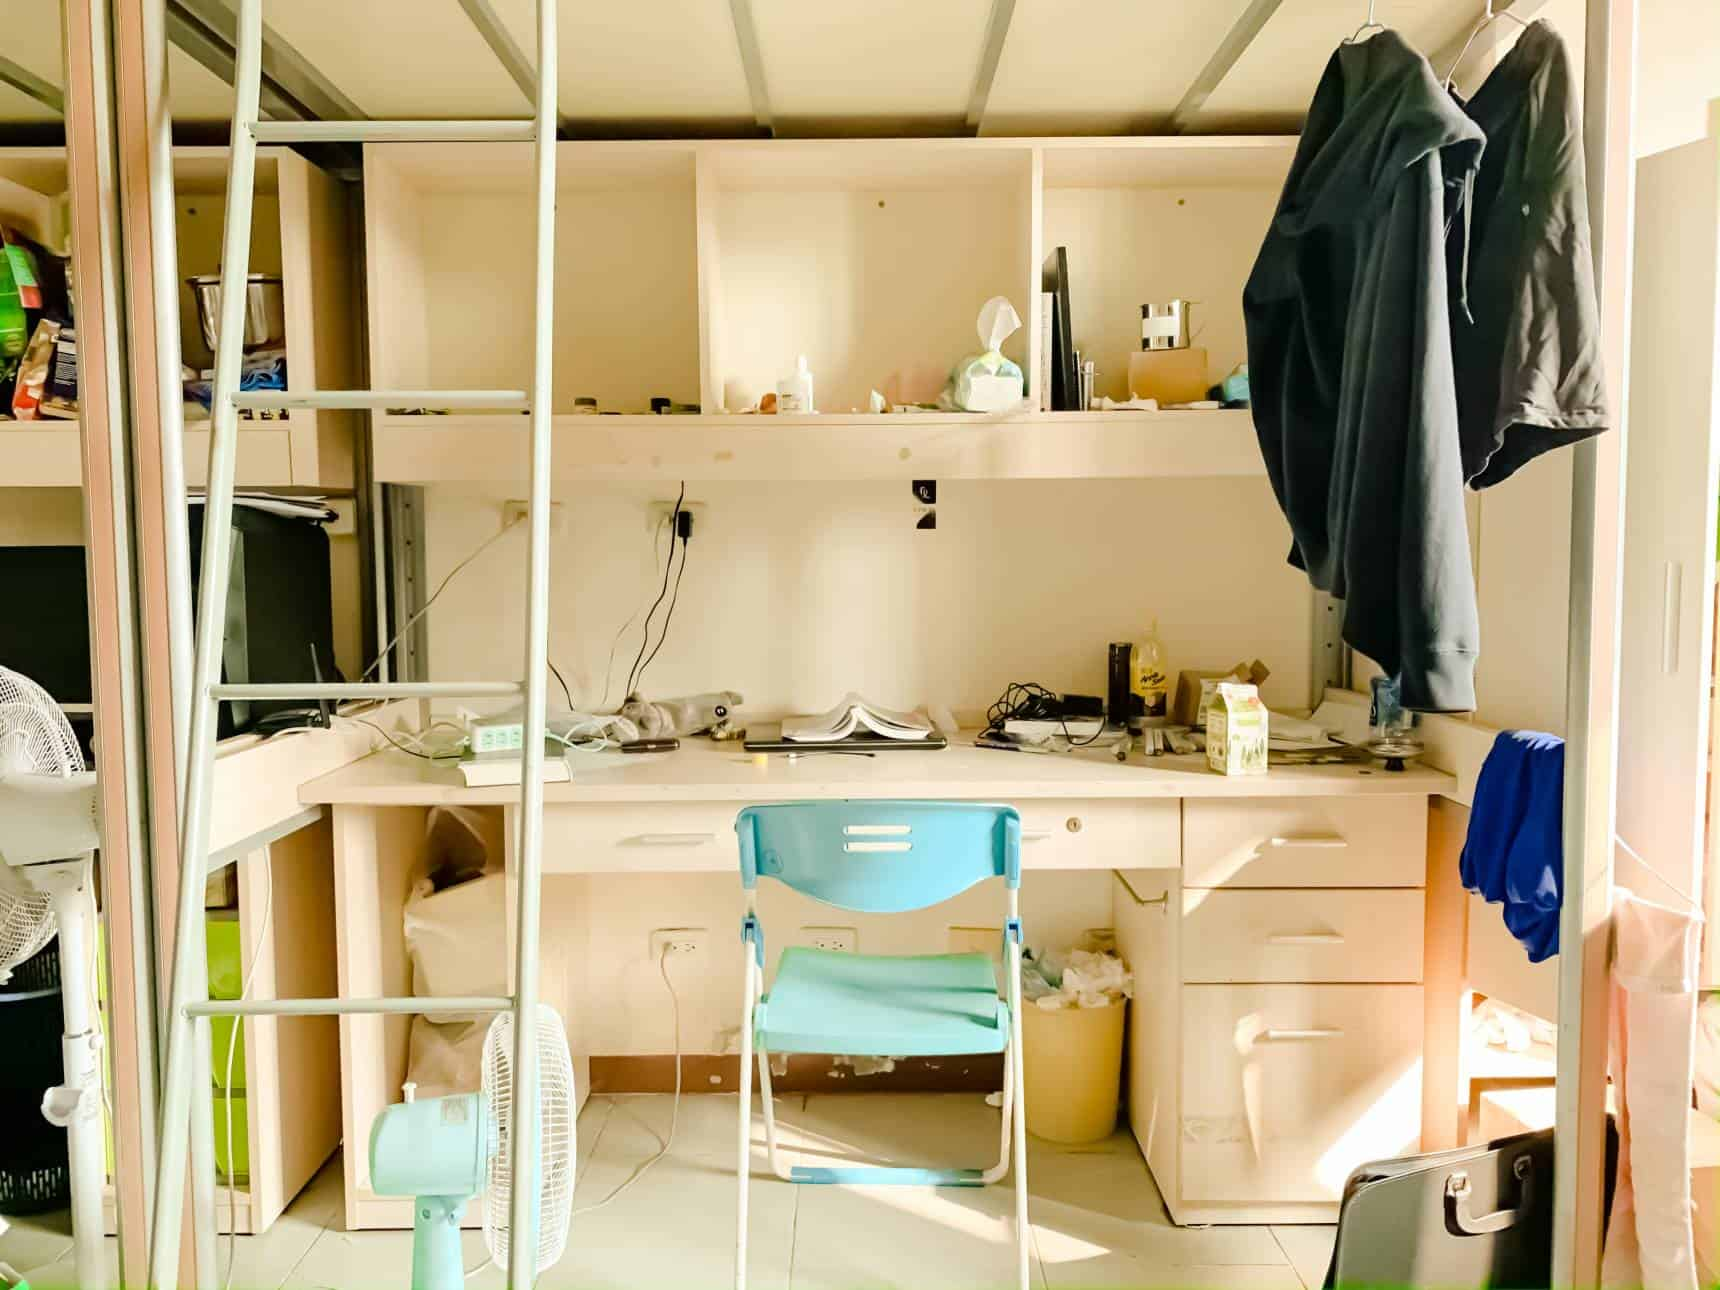 A functional dormitory room arrangement